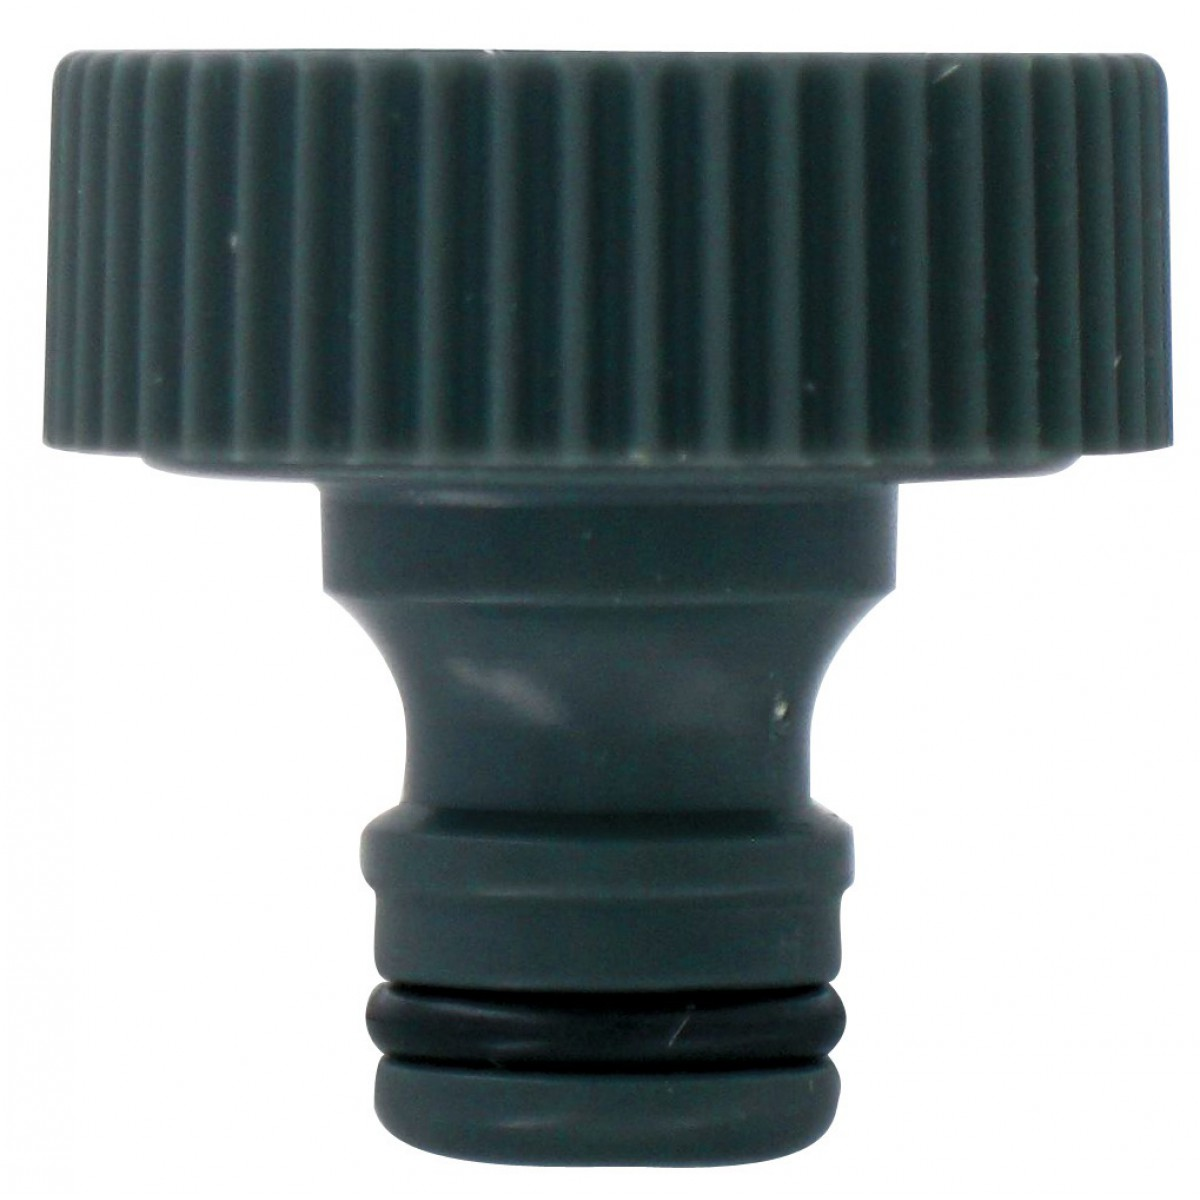 Nez de robinet Femelle Cap Vert - Filetage 26 x 34 mm